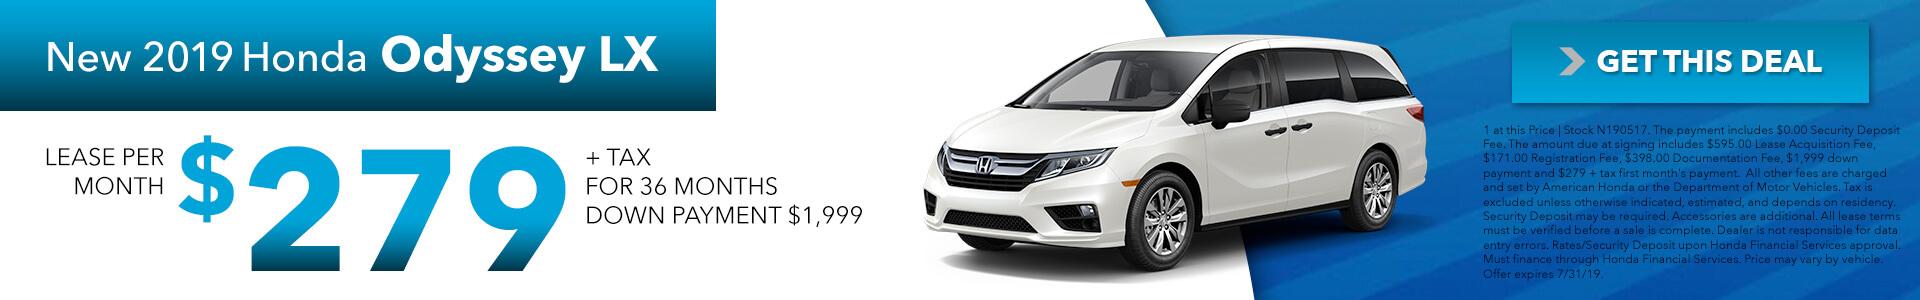 2019 Honda Odyssey 279 Per Month